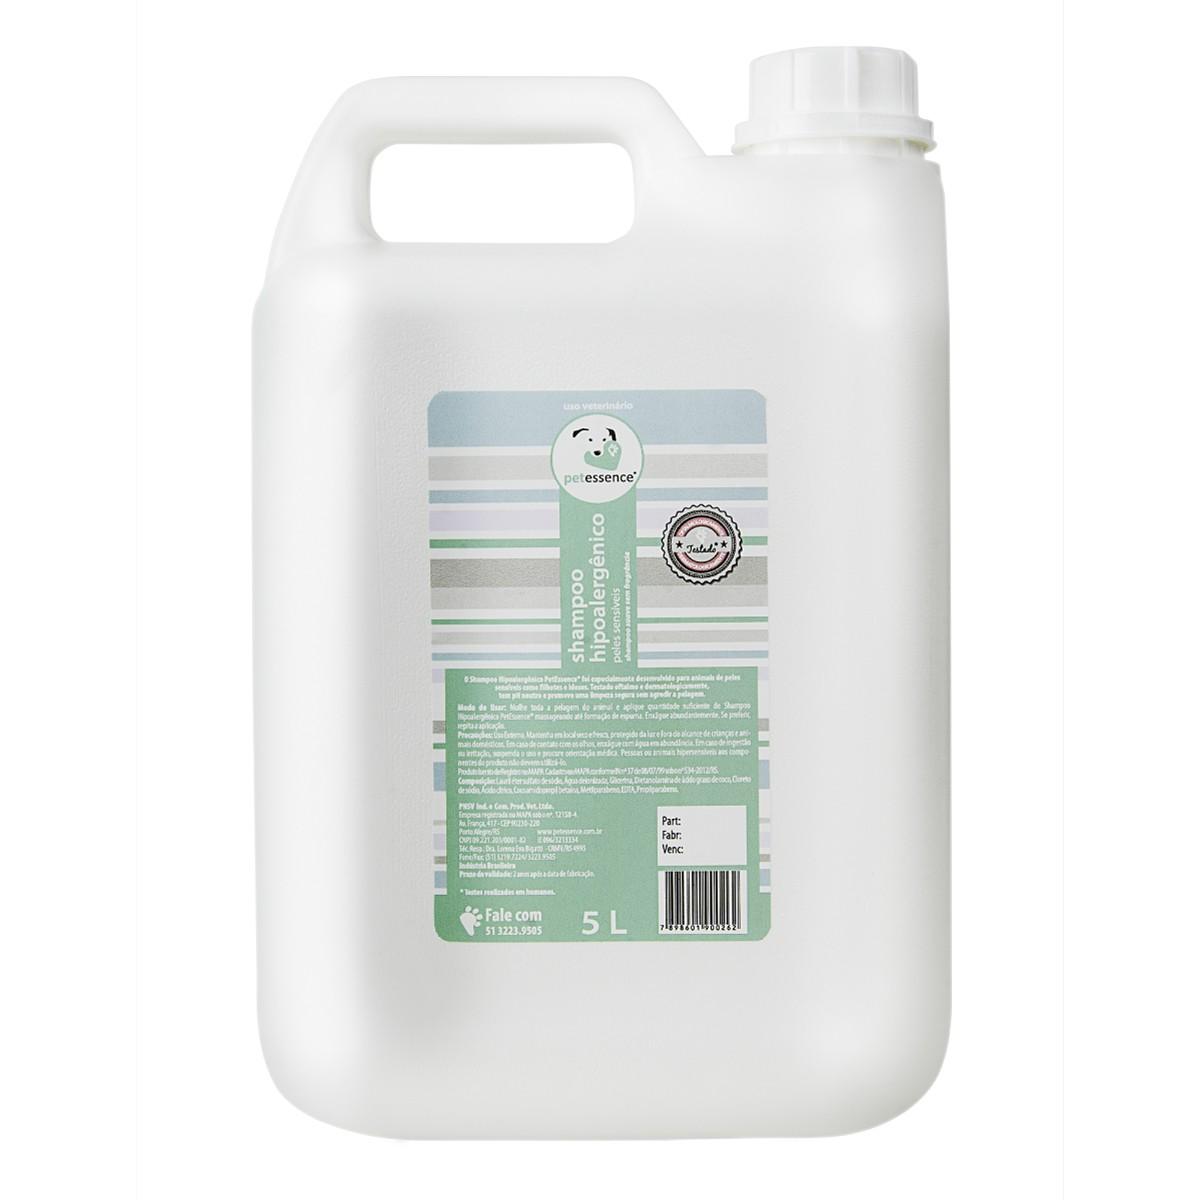 Shampoo Hipoalergênico 5L PetEssence